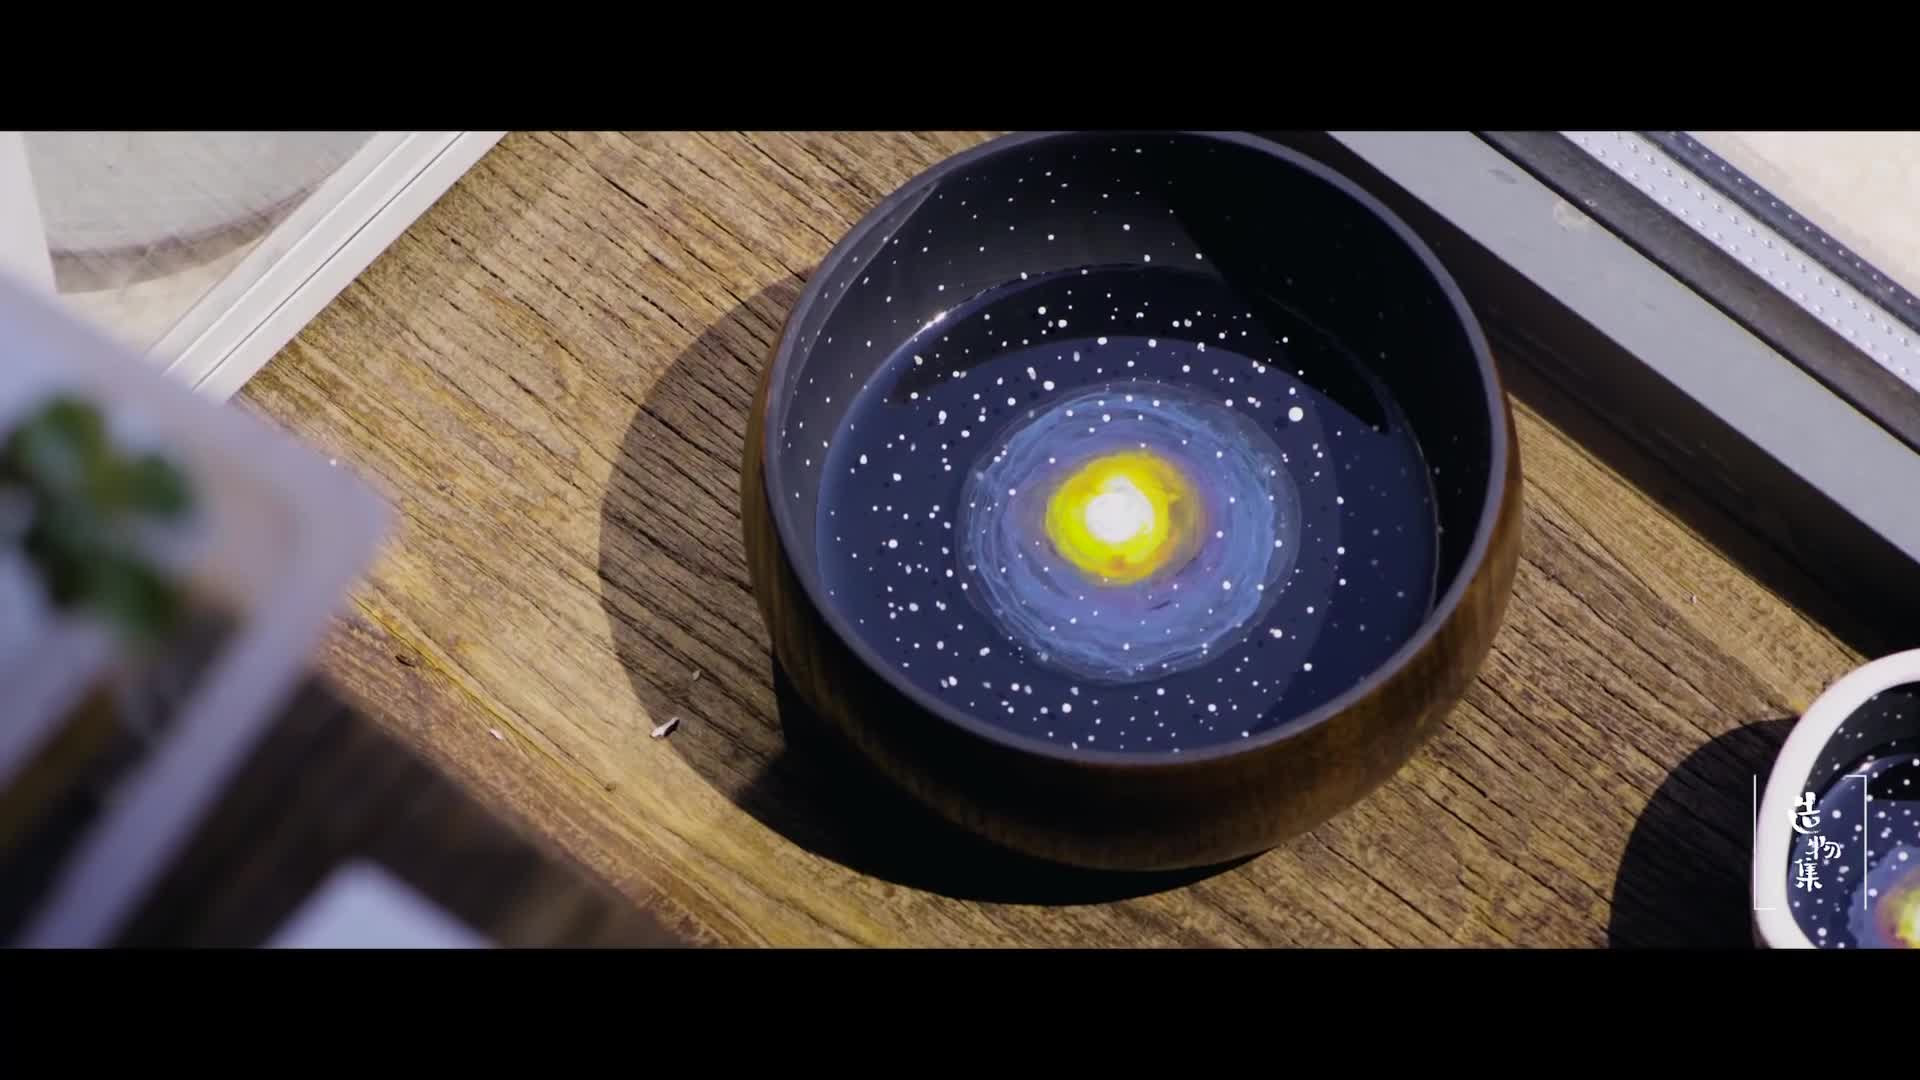 DIY创意透明树脂滴胶画:碗里的星空